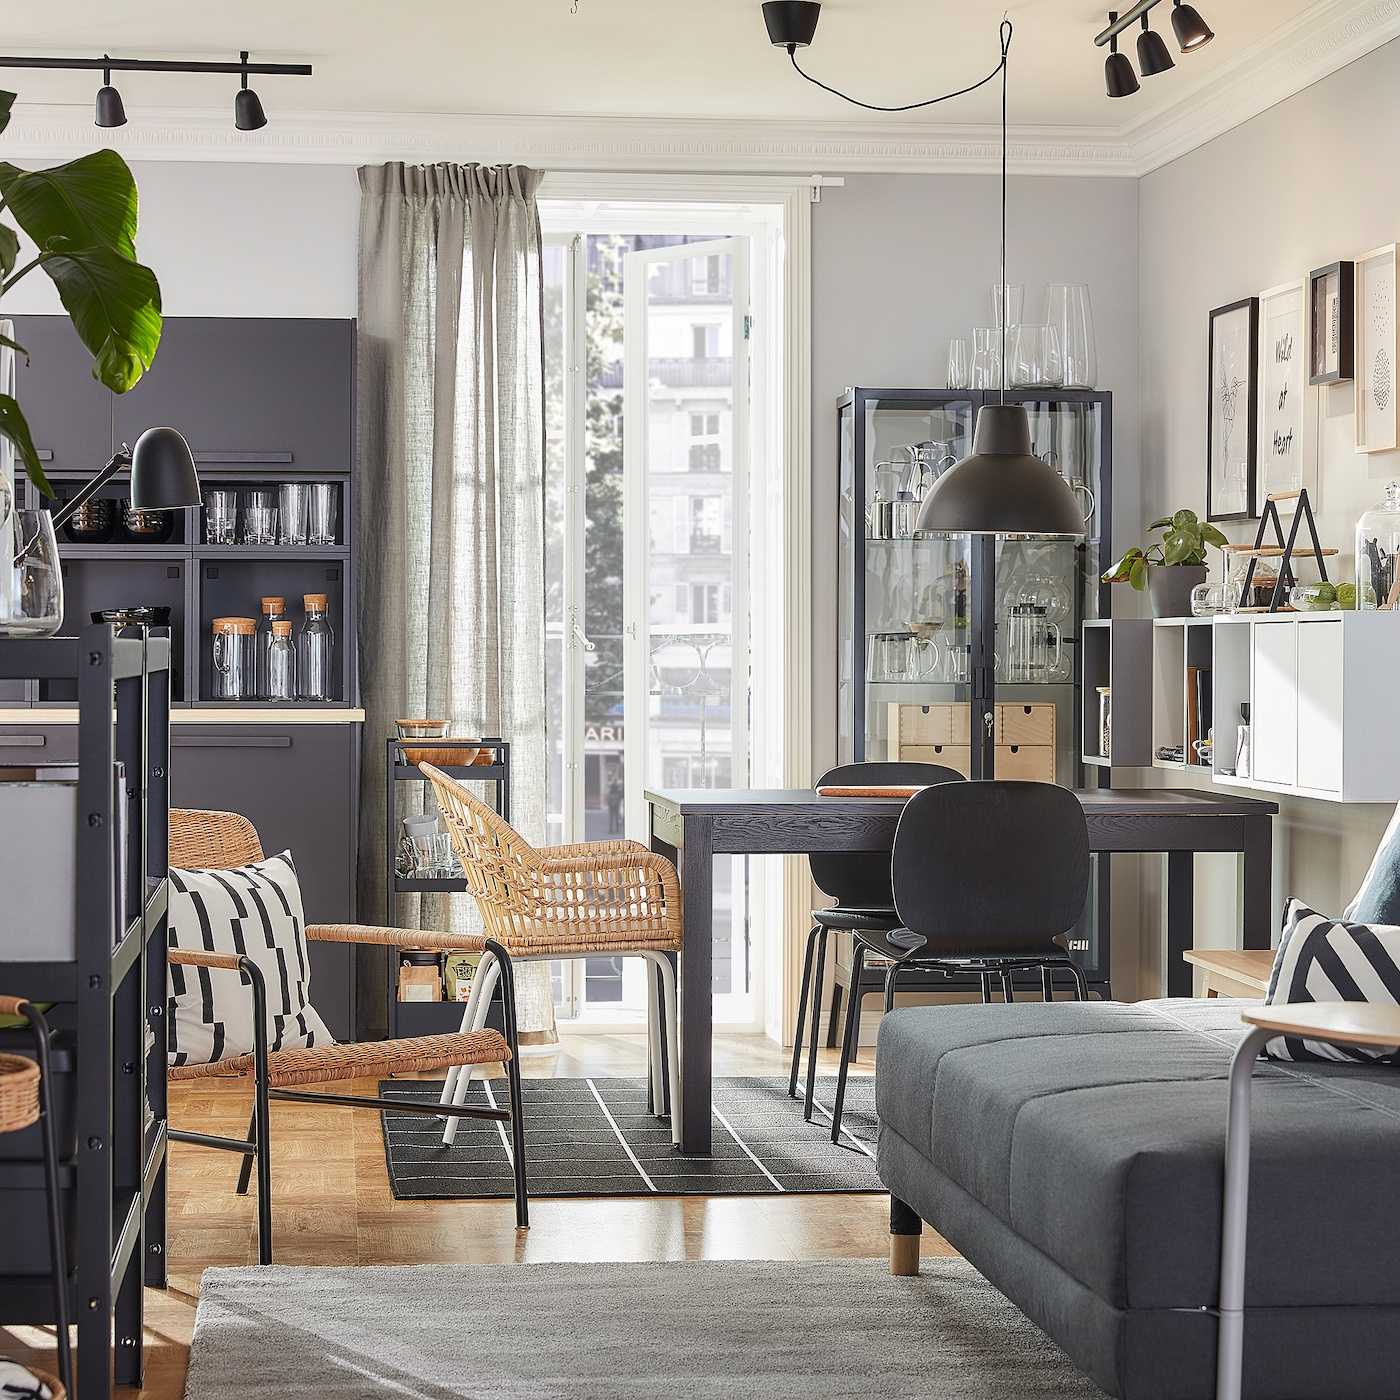 Mobili Per La Sala Ikea idee per arredare la sala da pranzo - ikea it